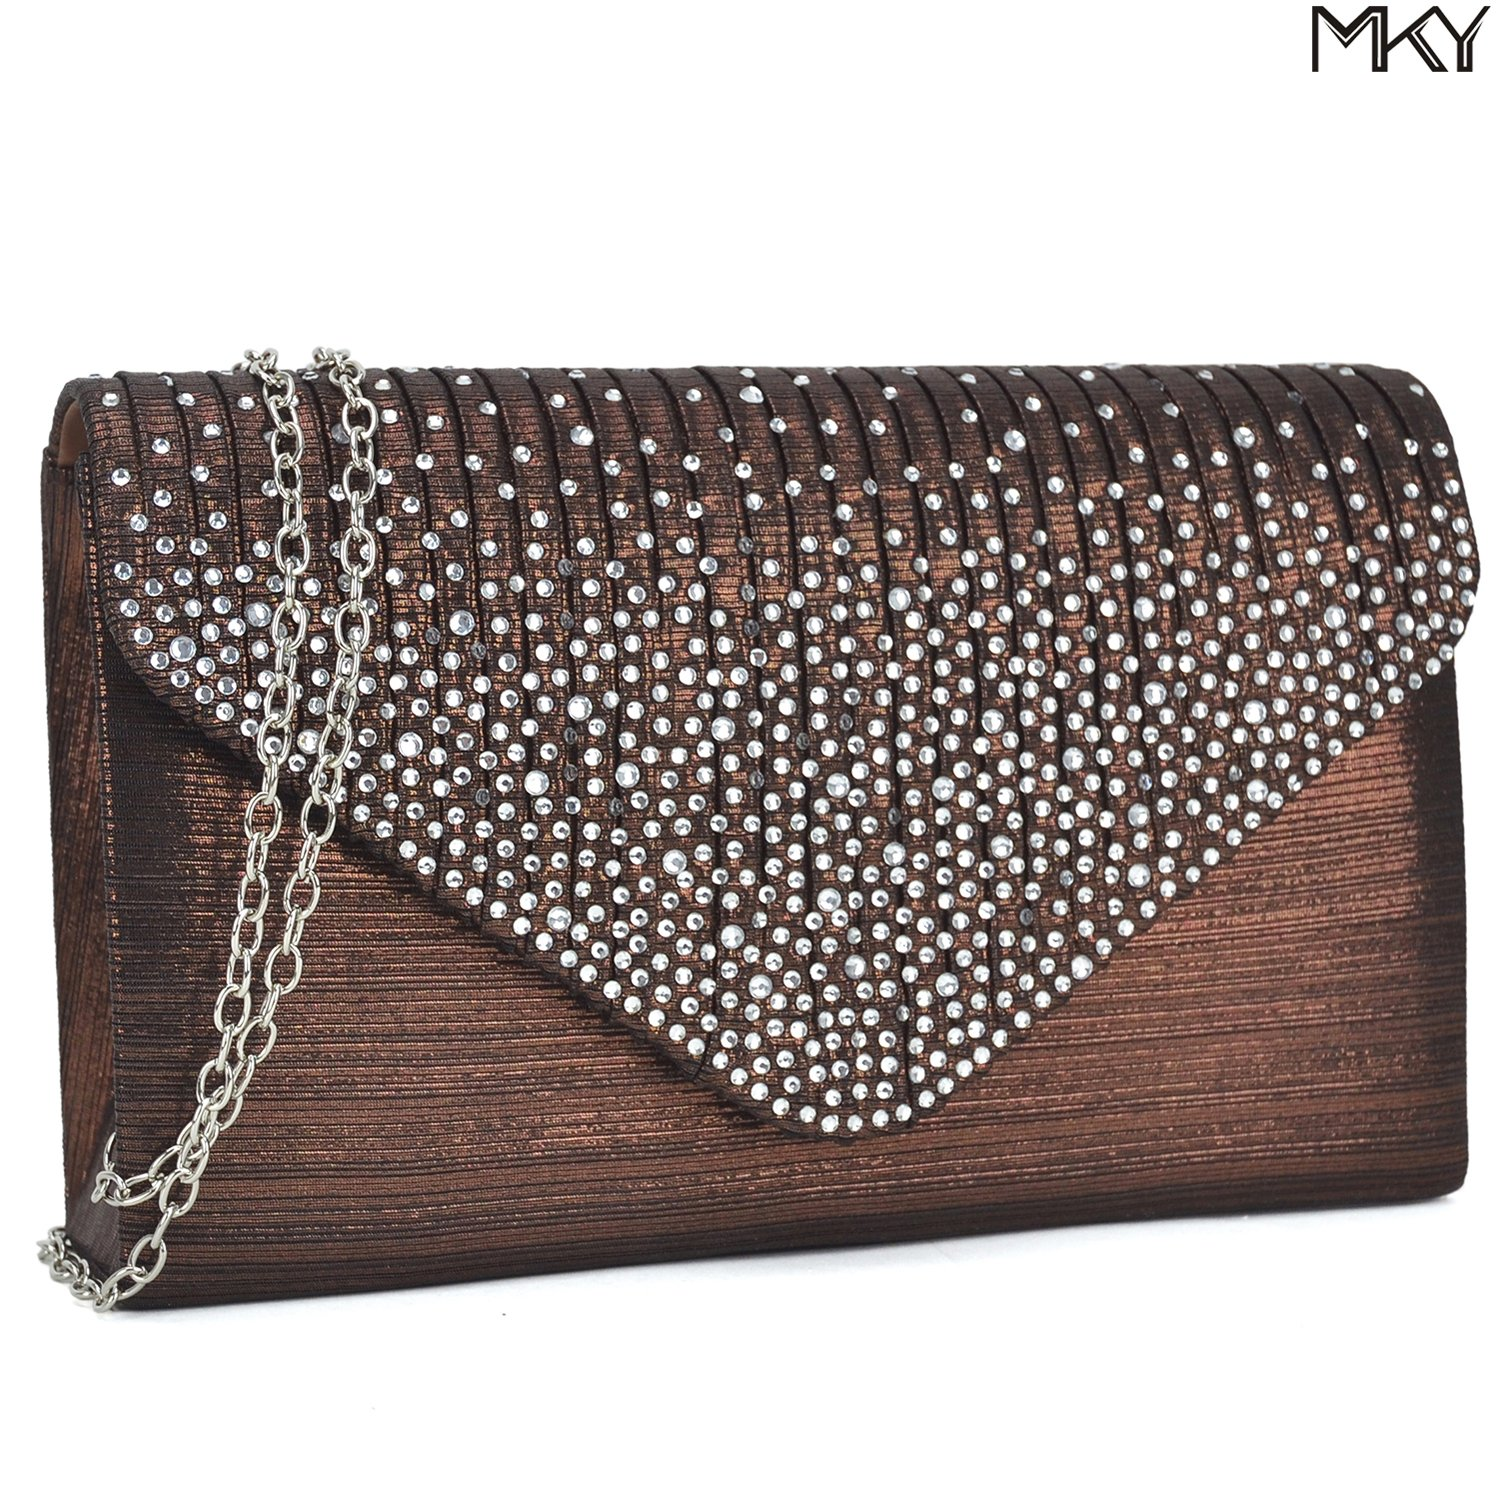 Womens Envelope Flap Clutch Handbag Evening Bag Purse Glitter Sequin Party Coffee